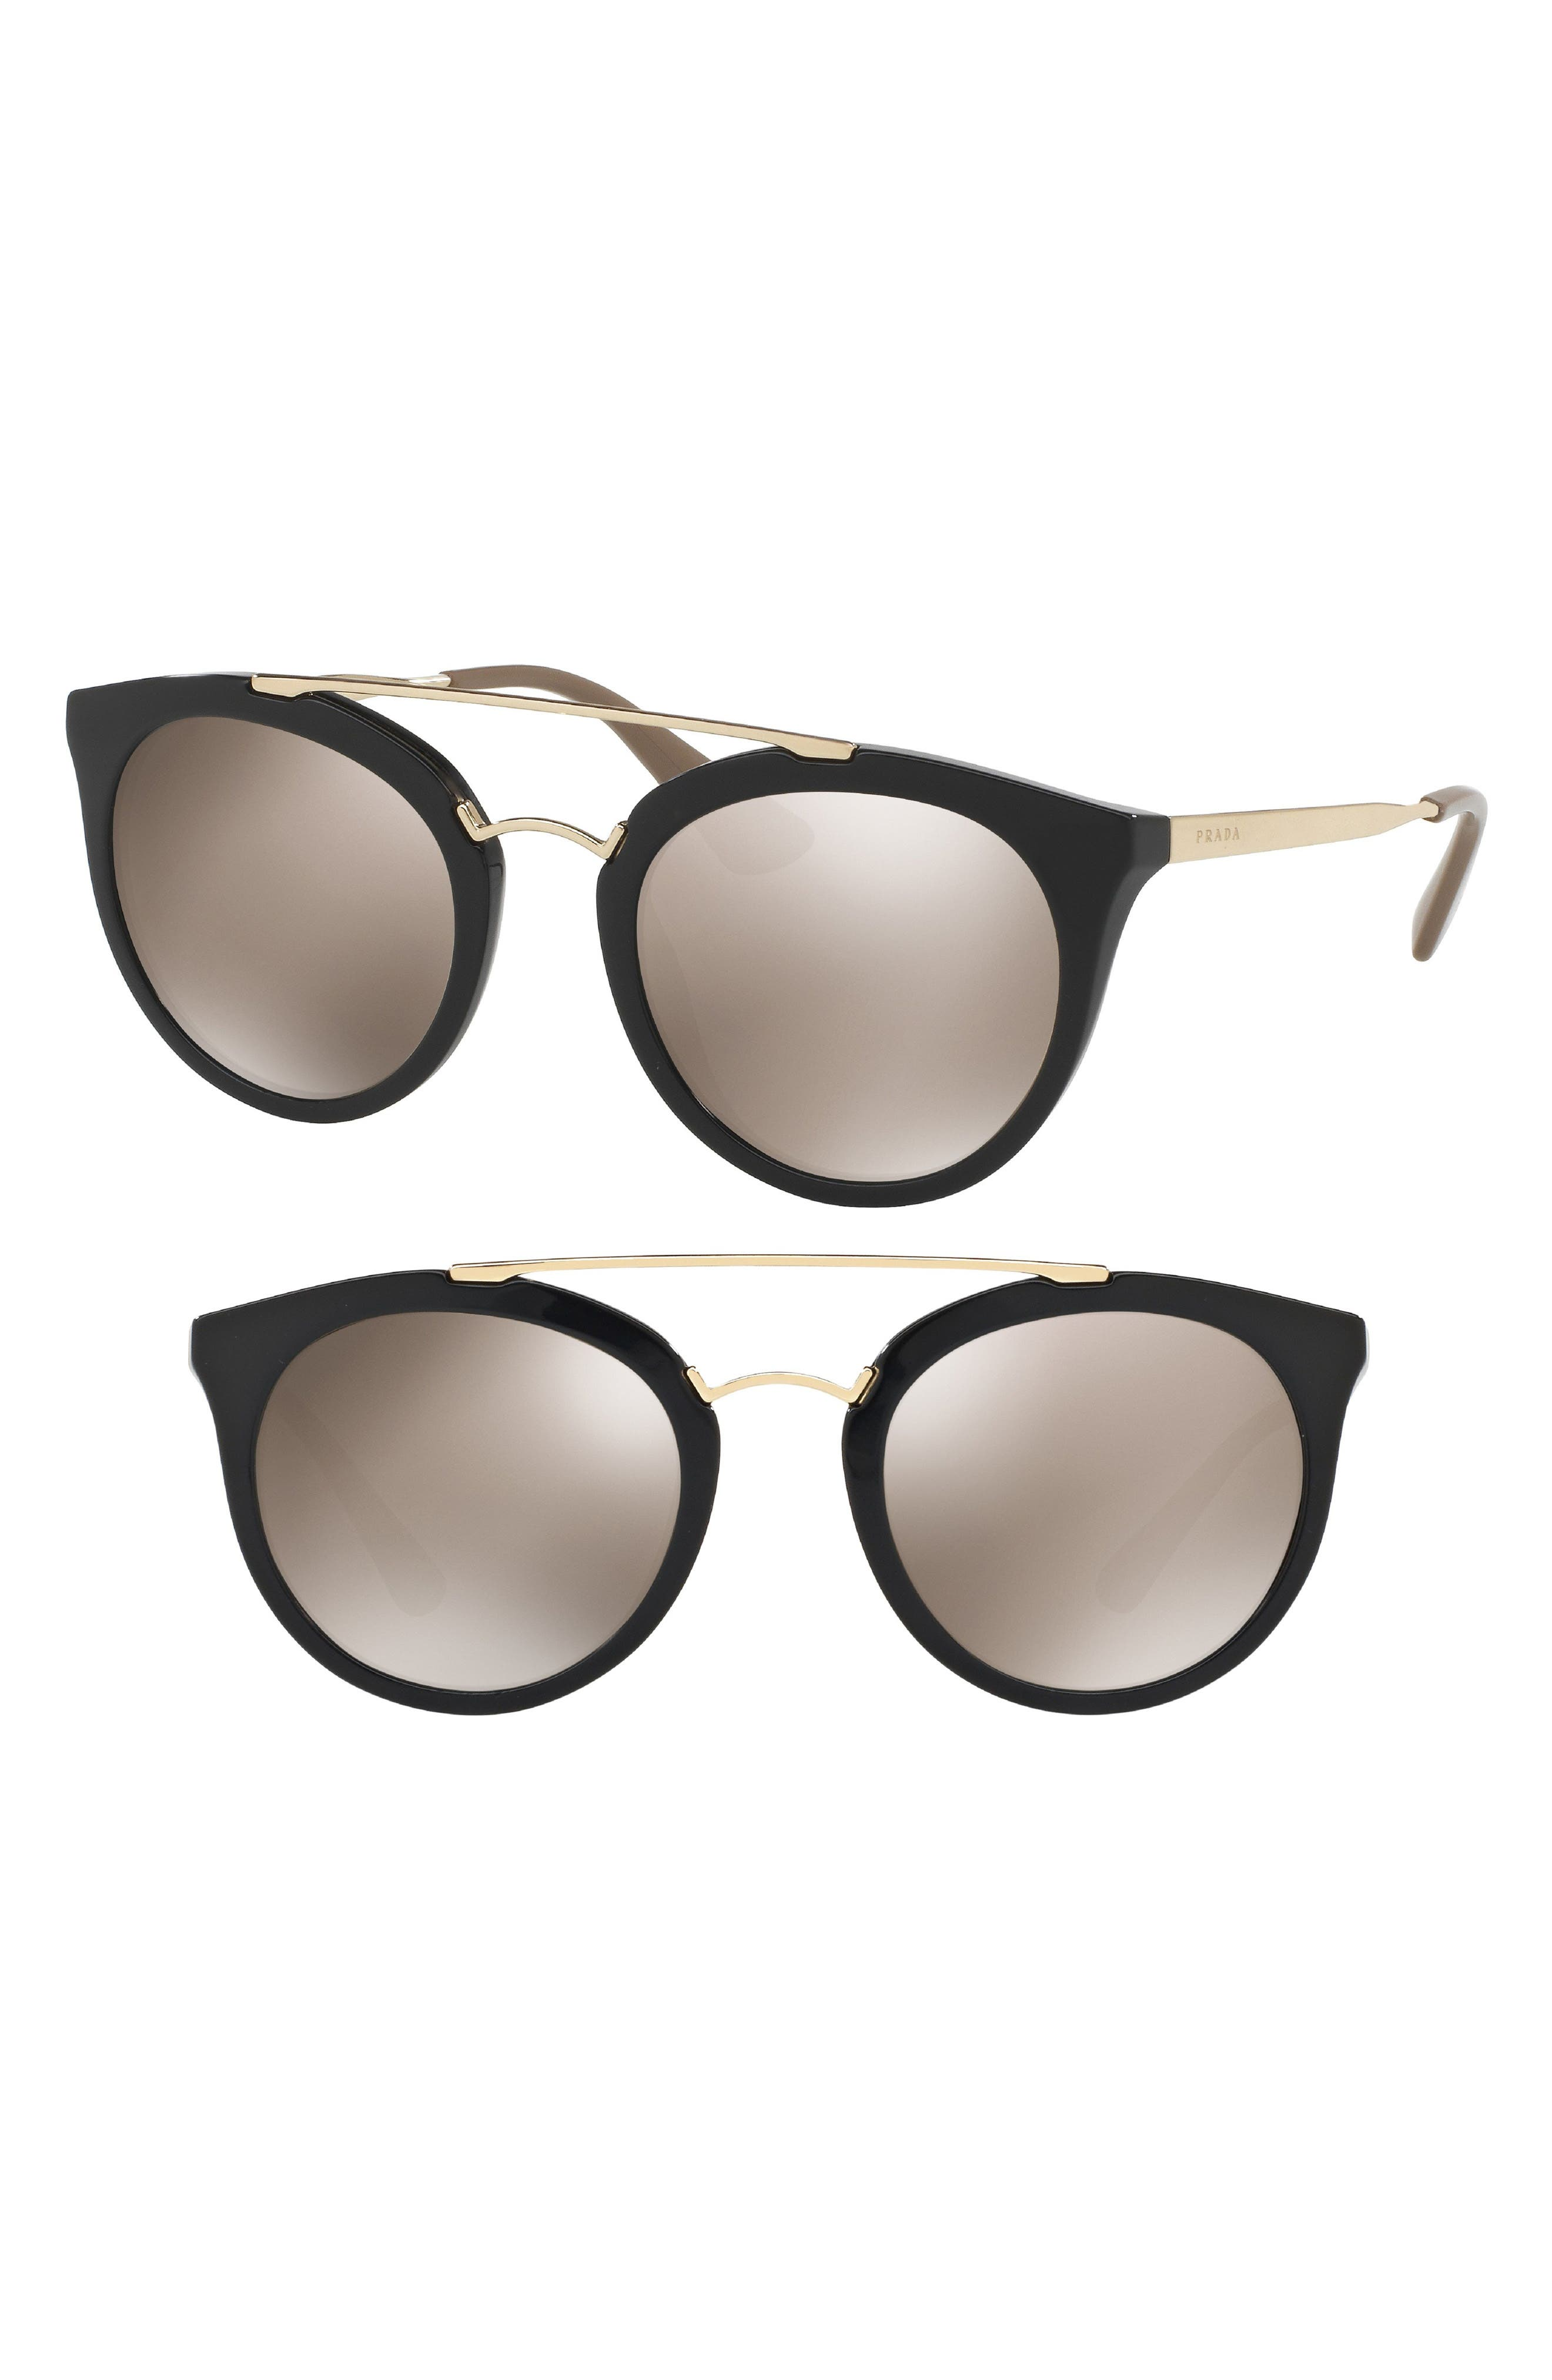 Double Bridge 52mm Sunglasses,                             Main thumbnail 1, color,                             008